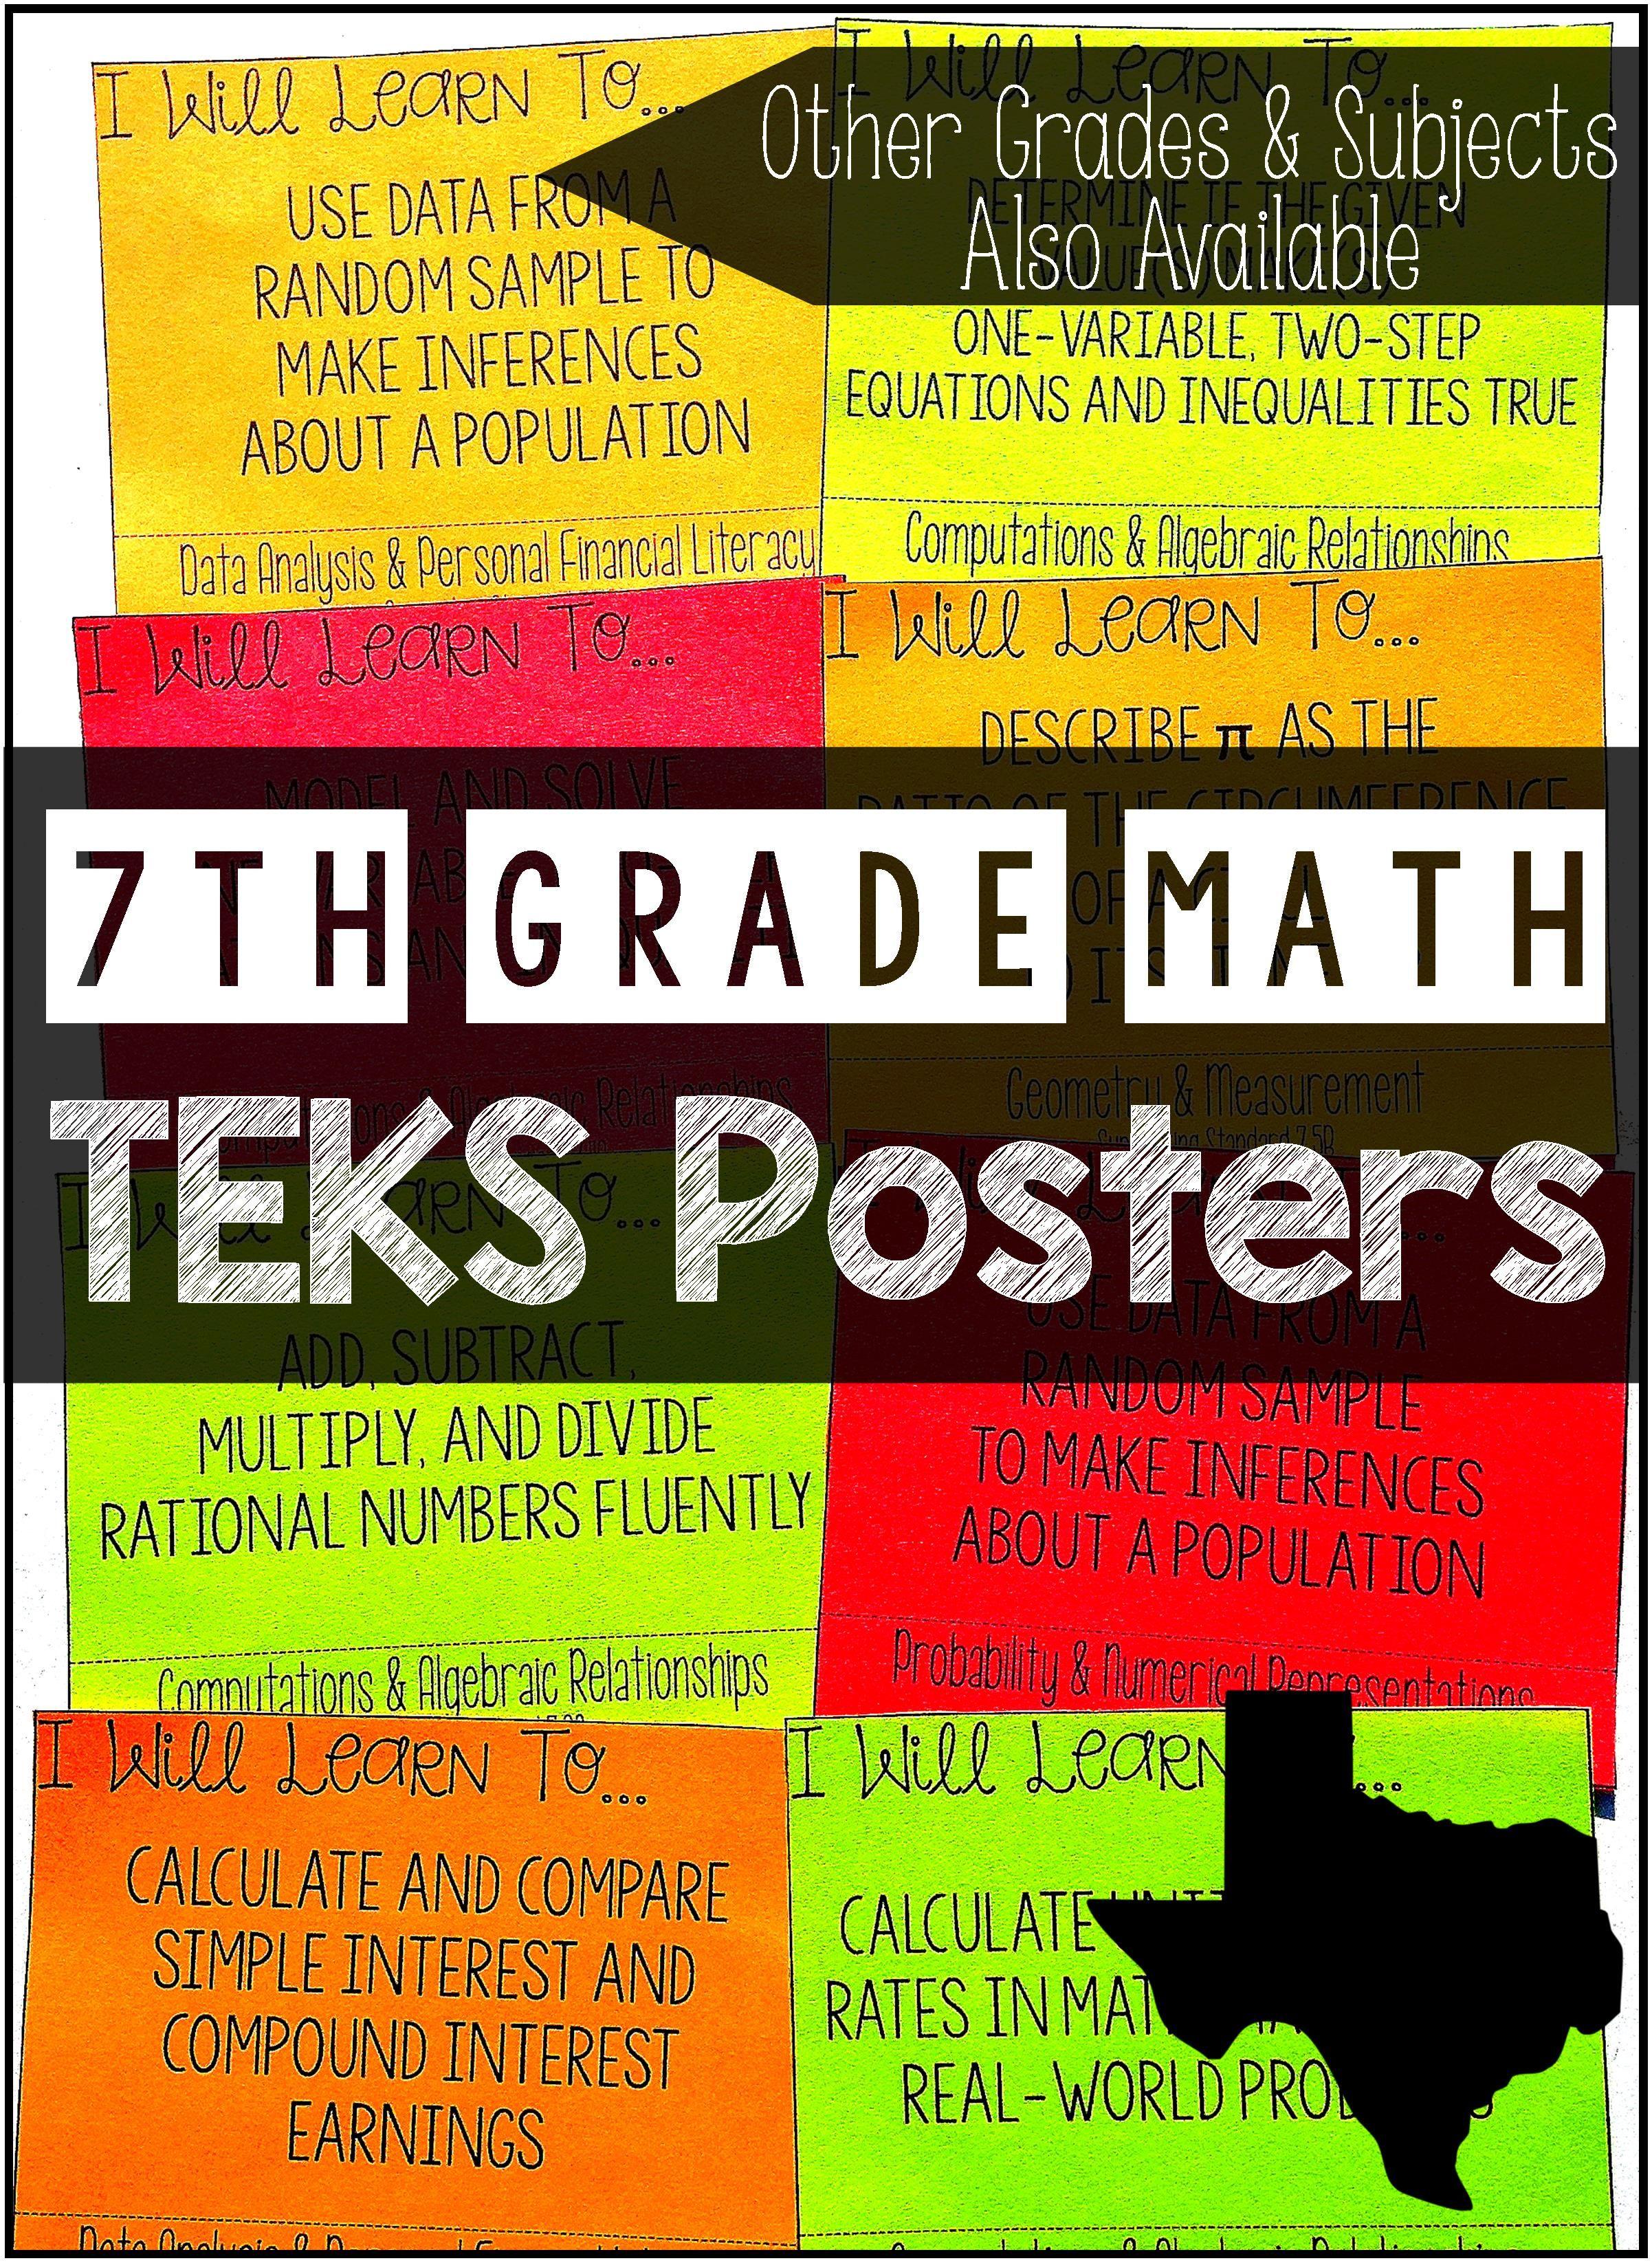 7th Grade Math Teks